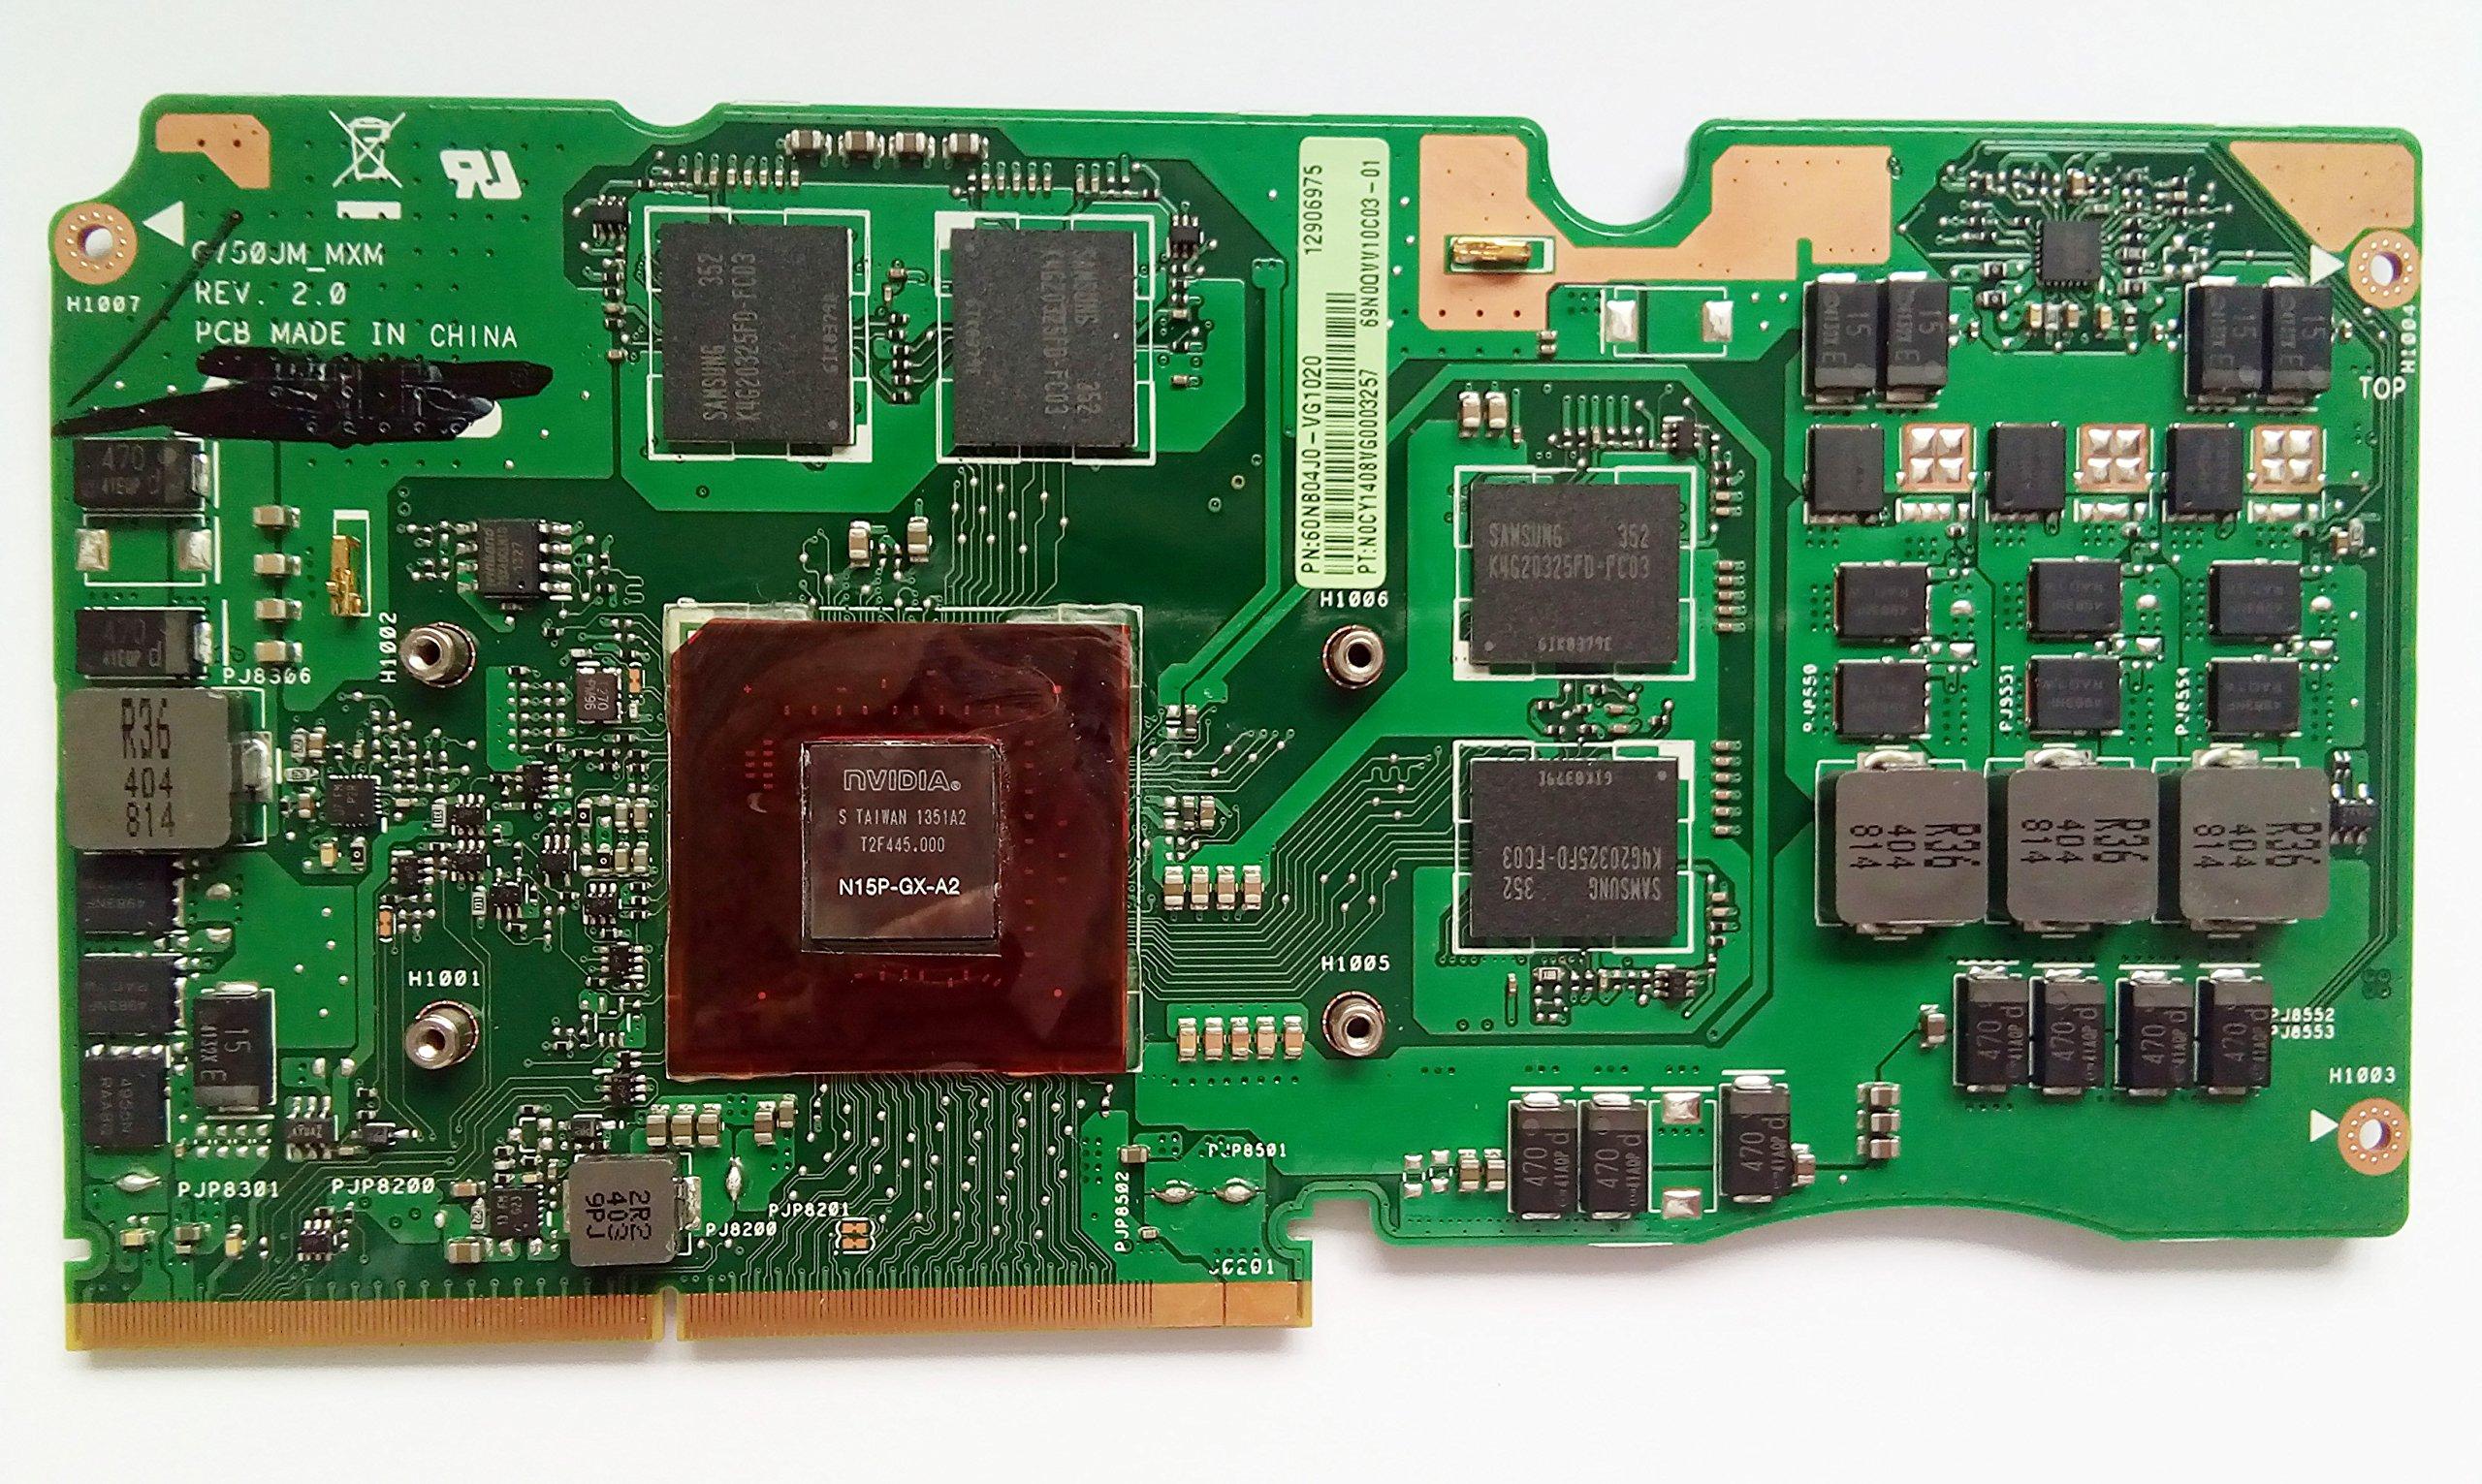 2G Laptop VGA Graphic Card N15P-GX-A2 for Asus ROG G750JM Laptop Video card Graphic VGA GeForce GTX 60NB04J0-G1020